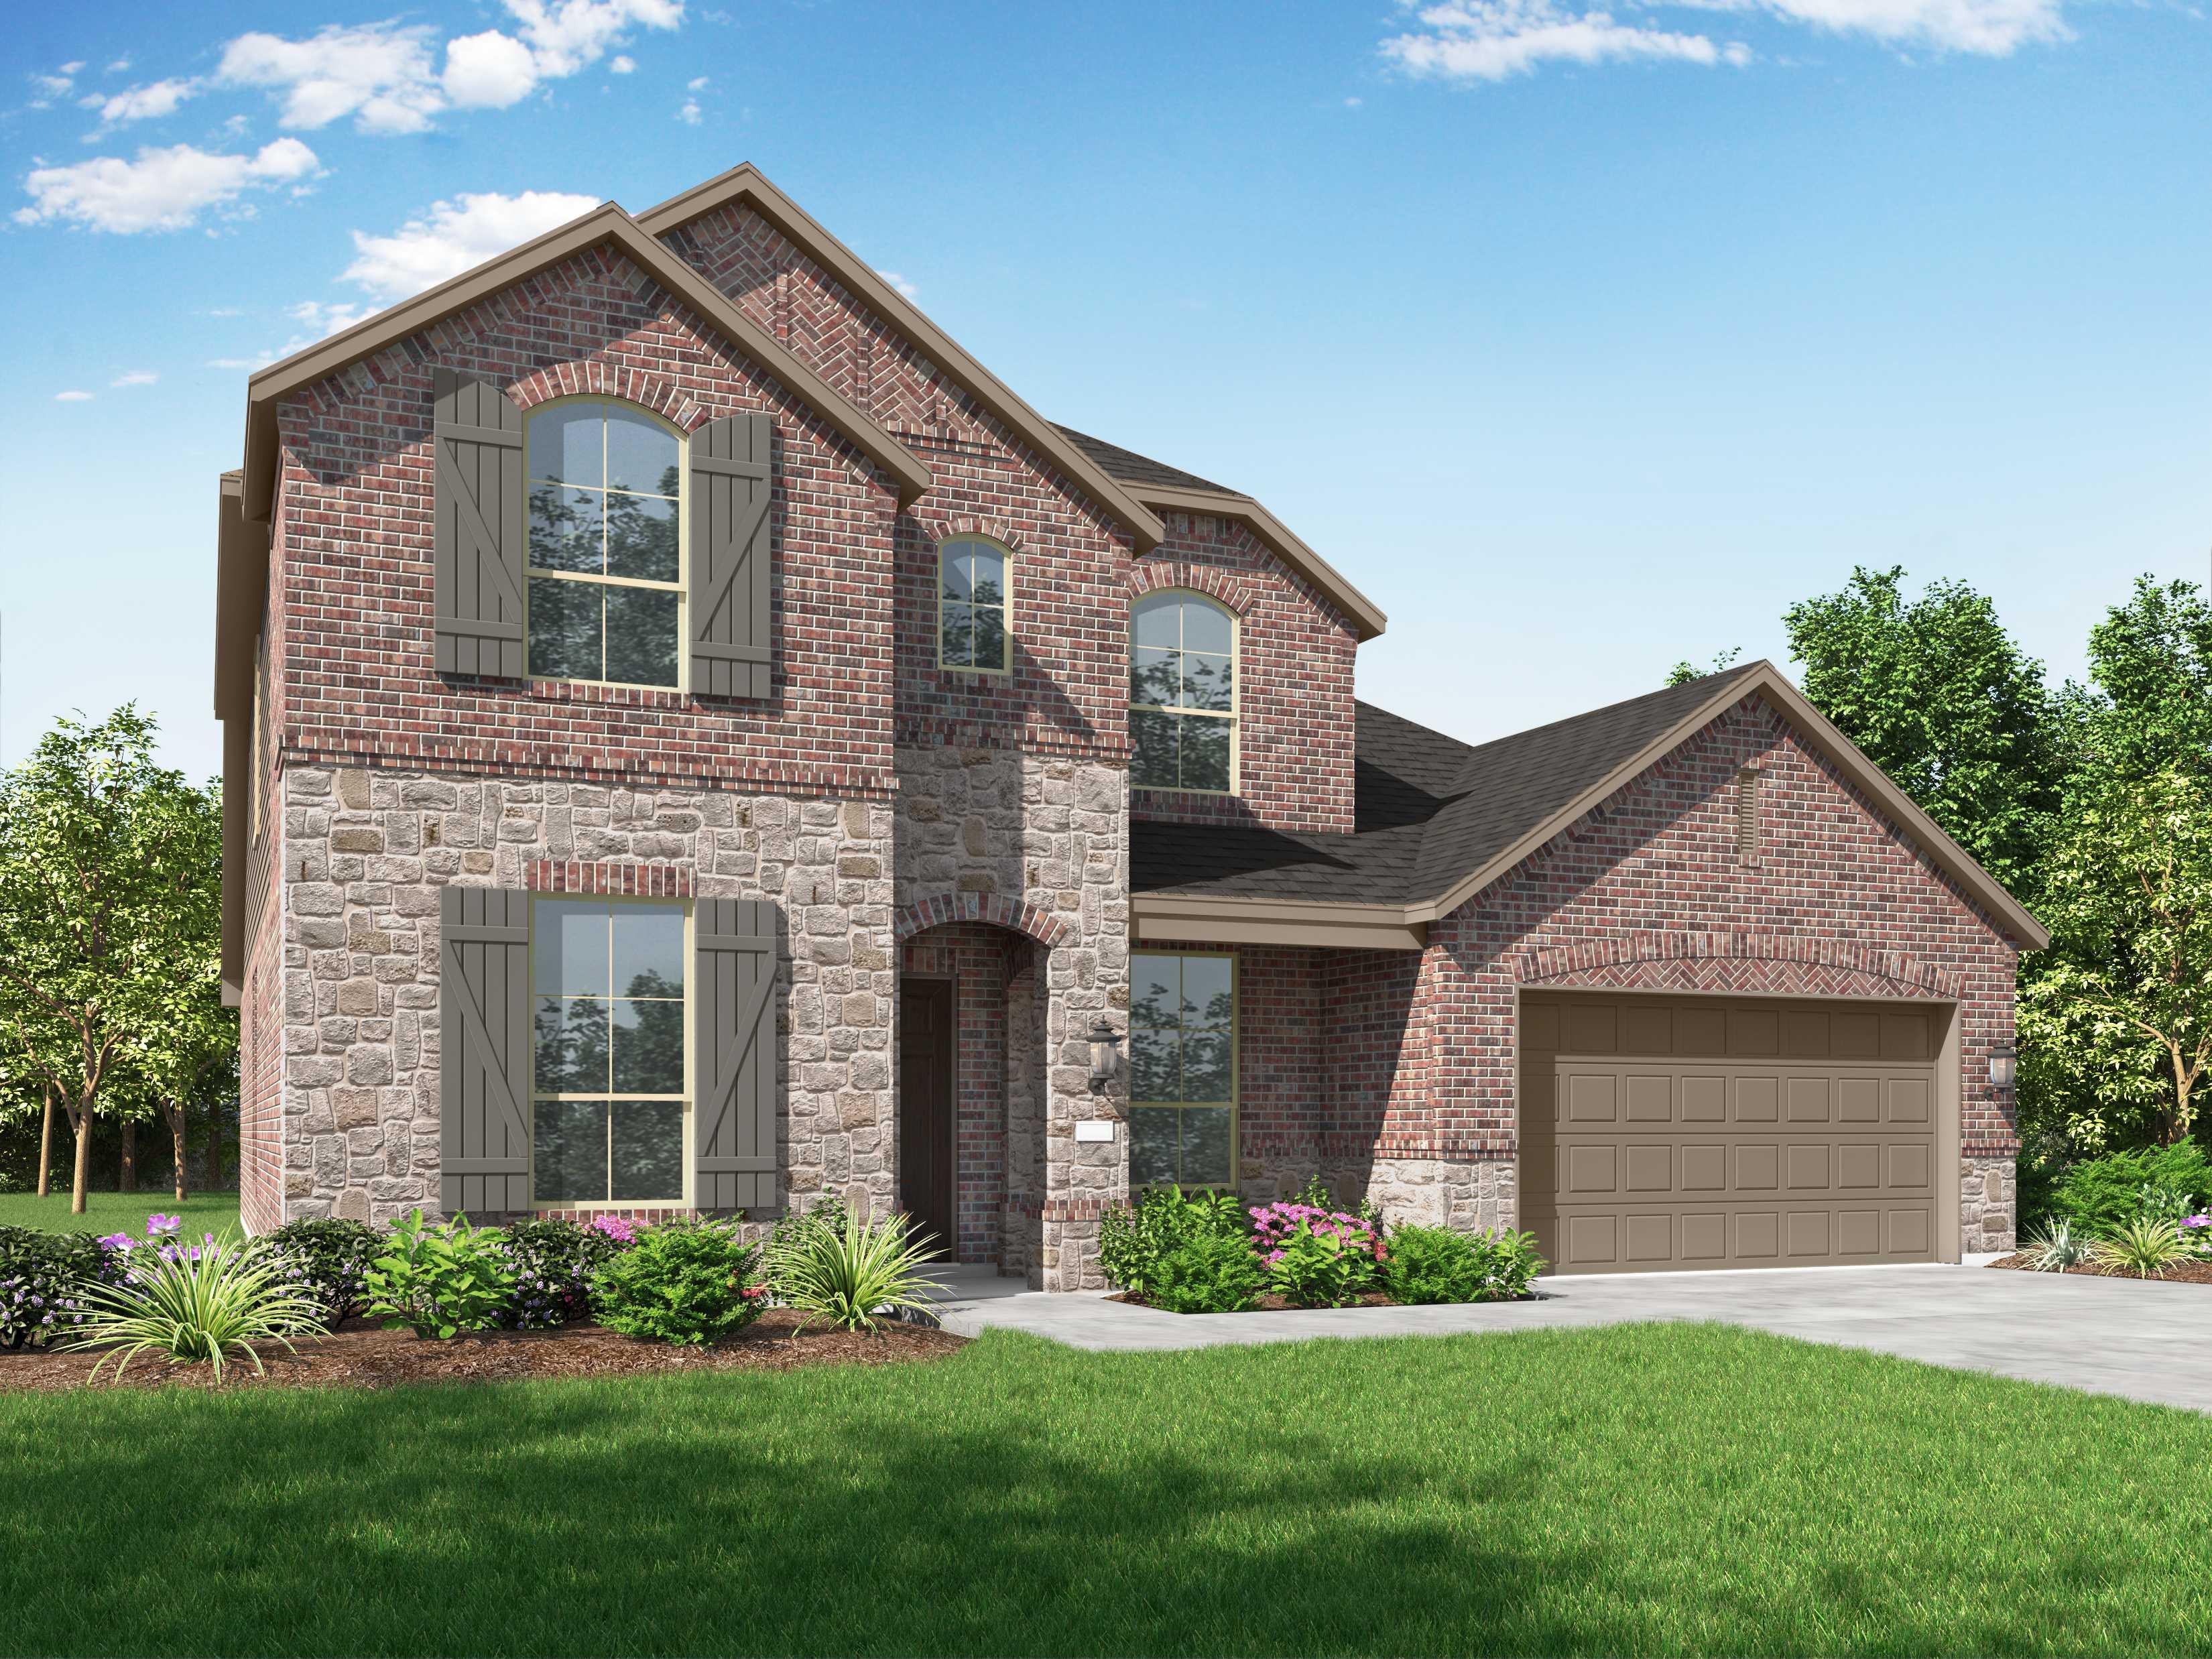 New Home Plan Wimbledon In San Antonio Tx 78254